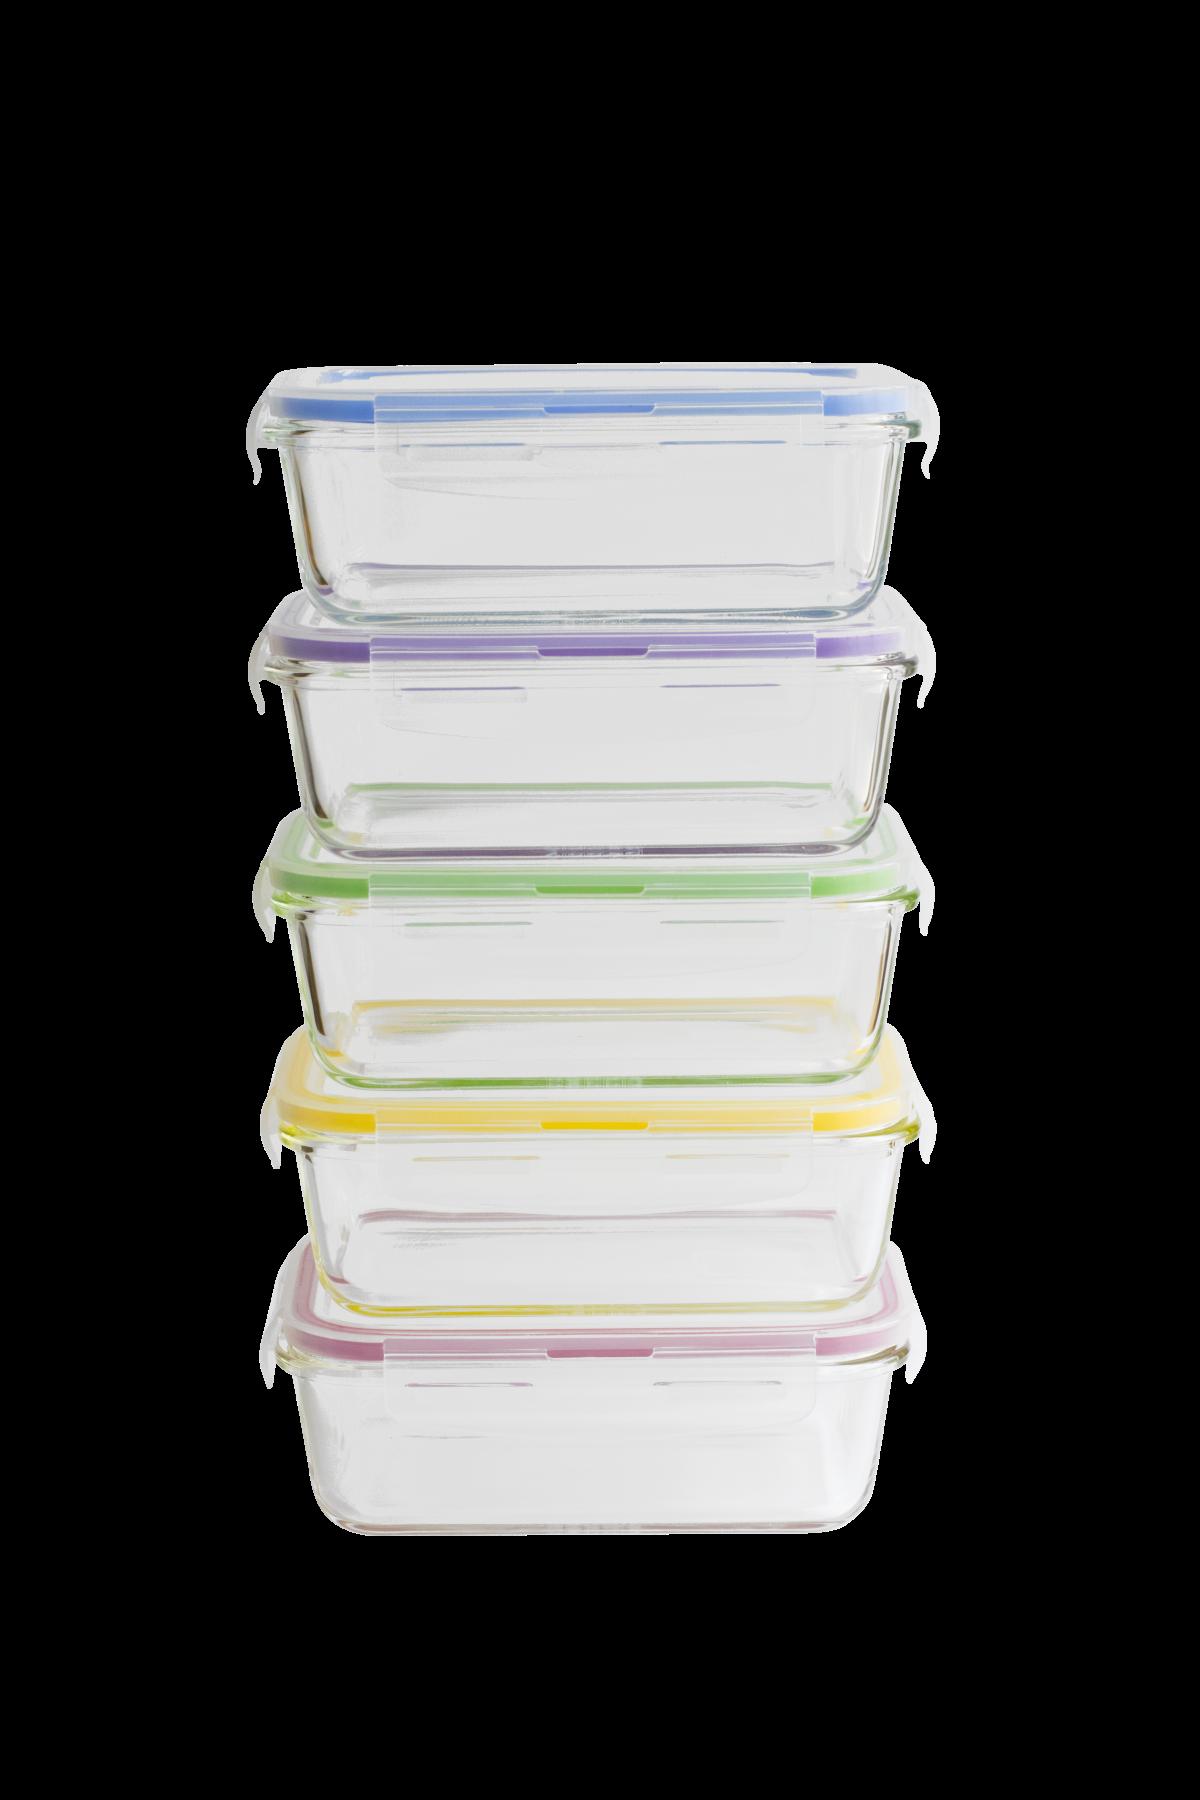 Set batch cooking  de 5 boîtes rectangulaires en verre